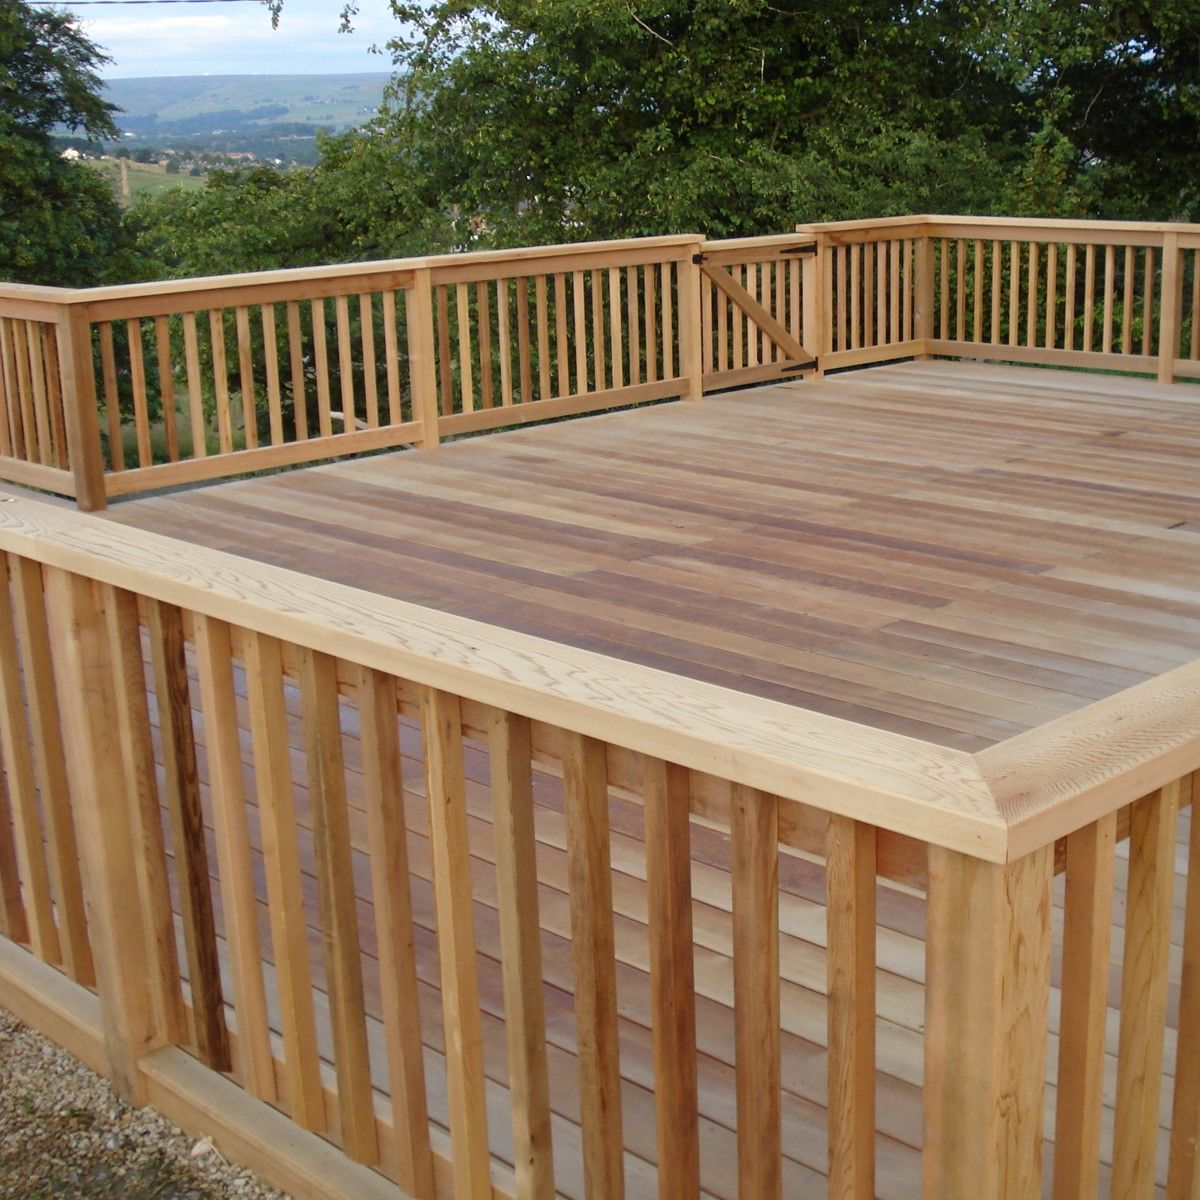 Best Wood Deck Railing Design Ideas View Plenty Deck Railing 400 x 300